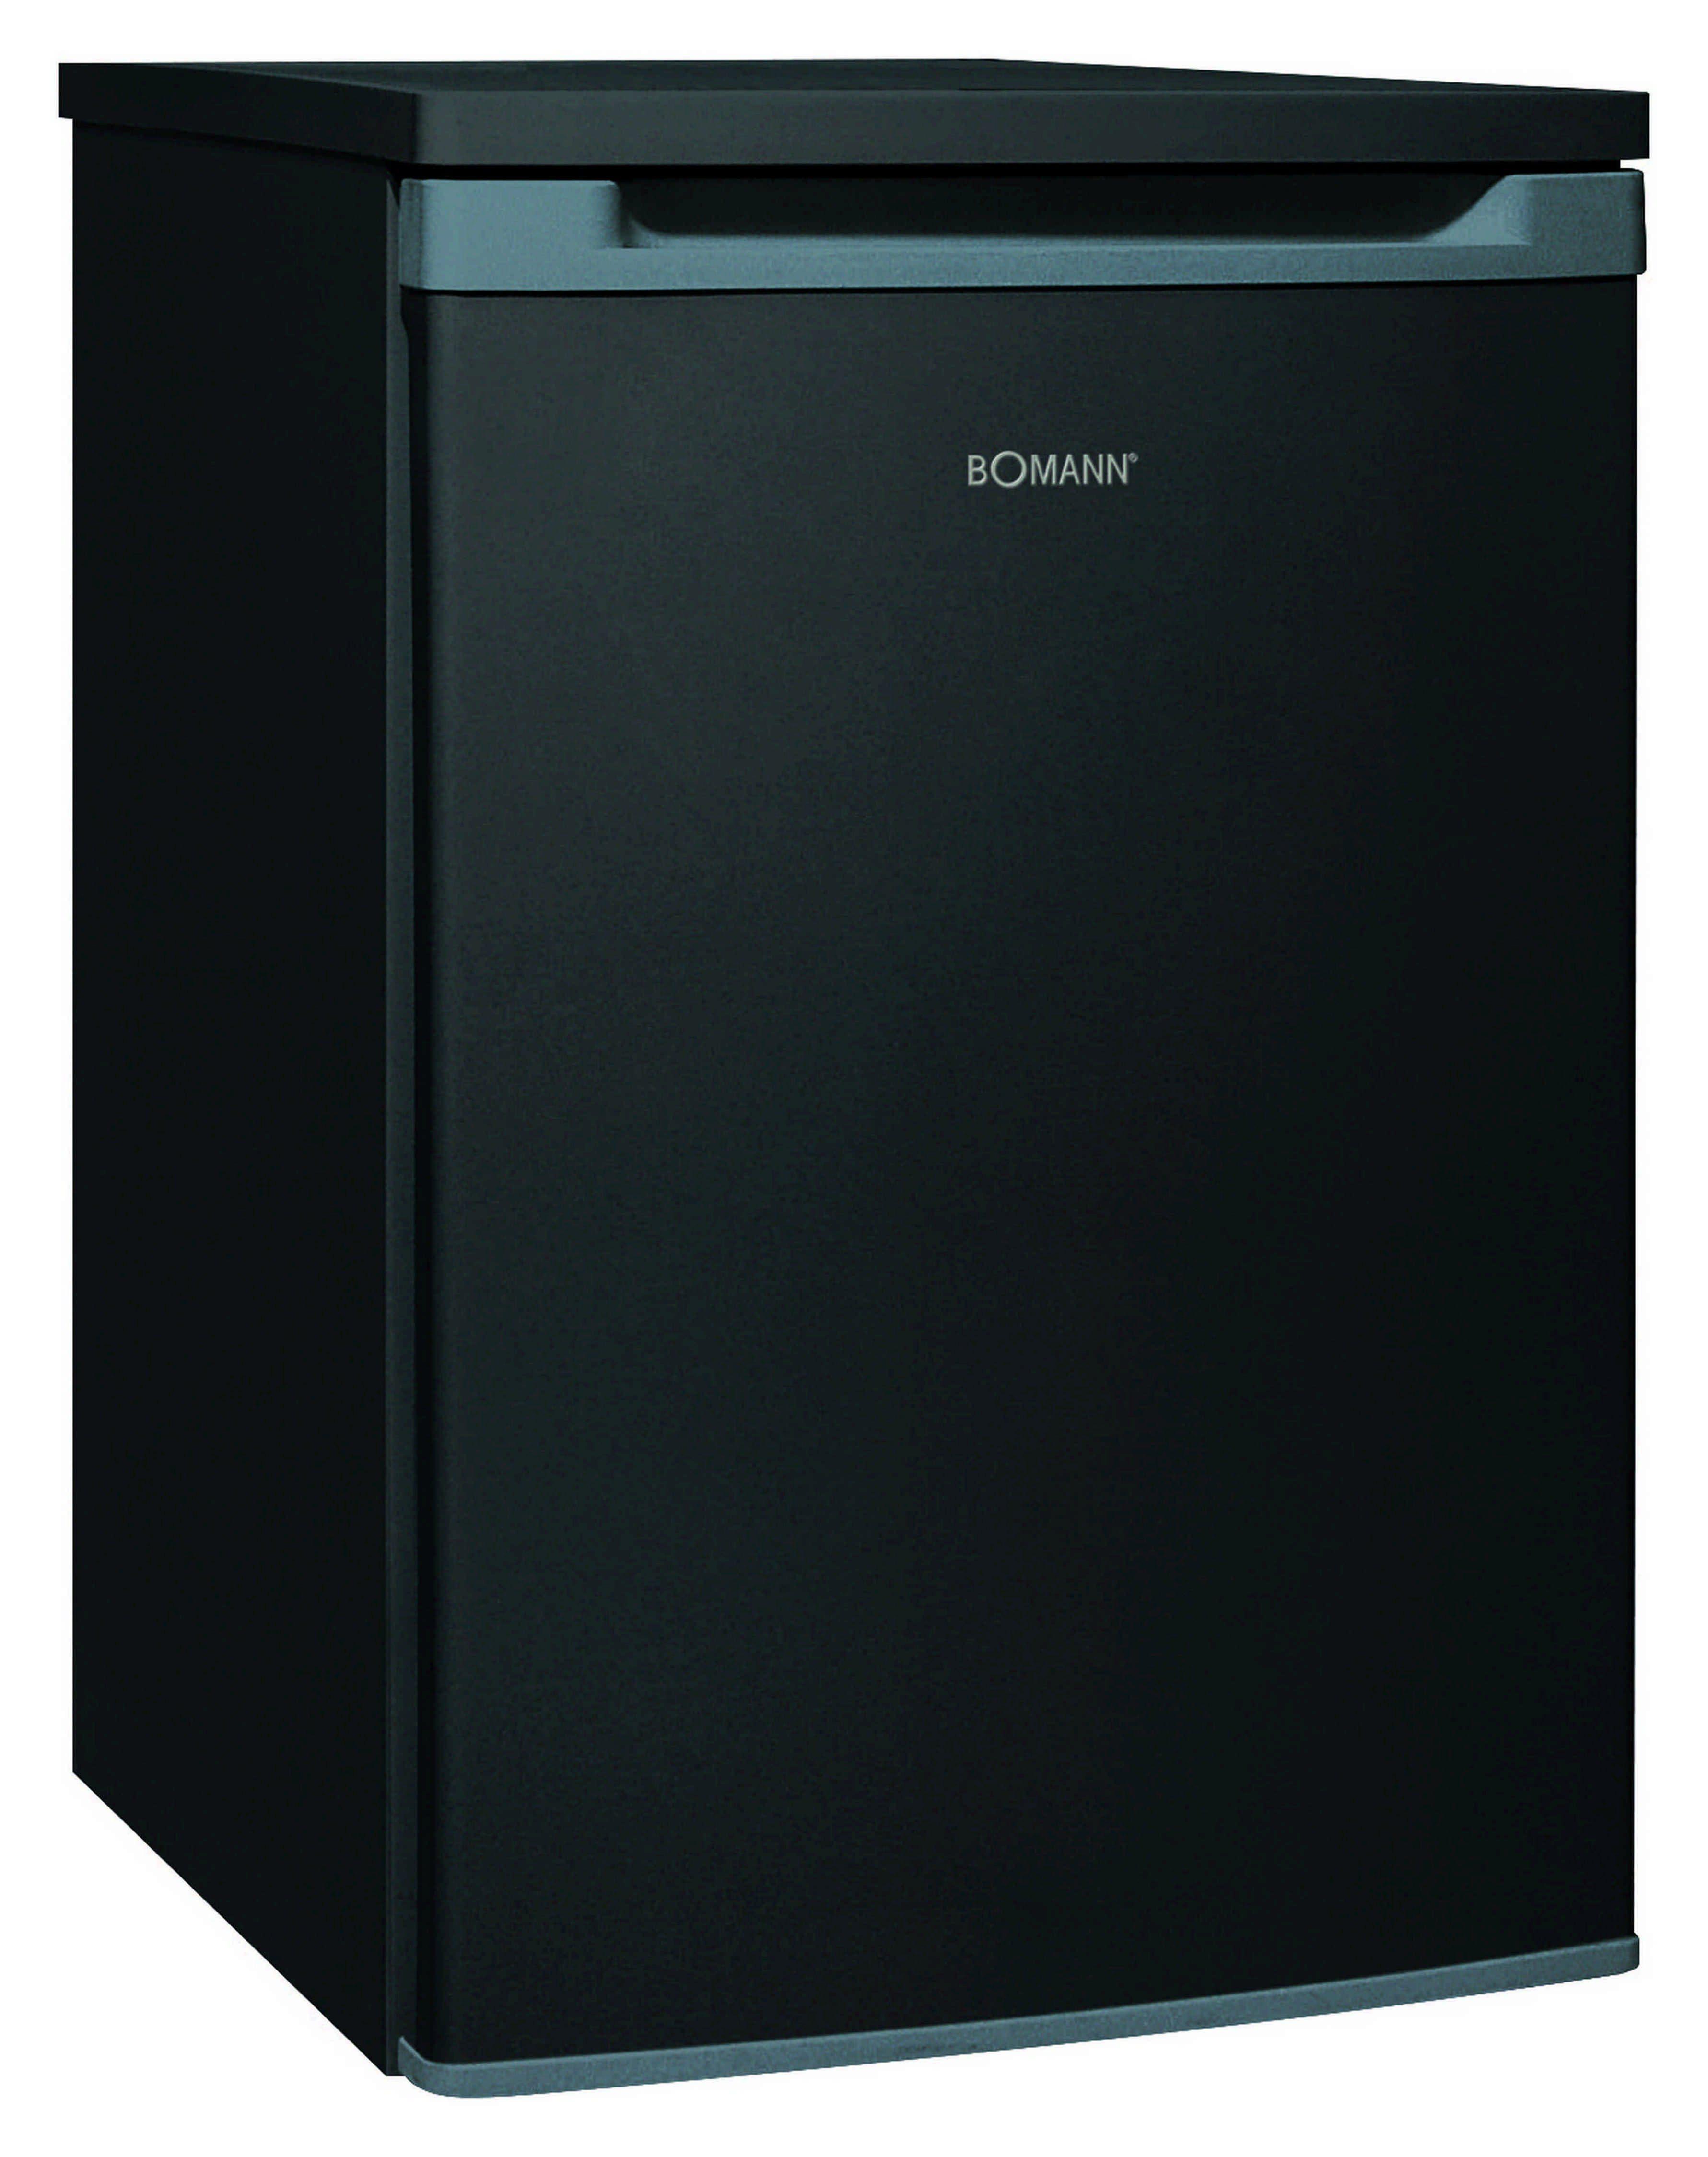 BOMANN Vollraum-Kühlschrank »VS 354«